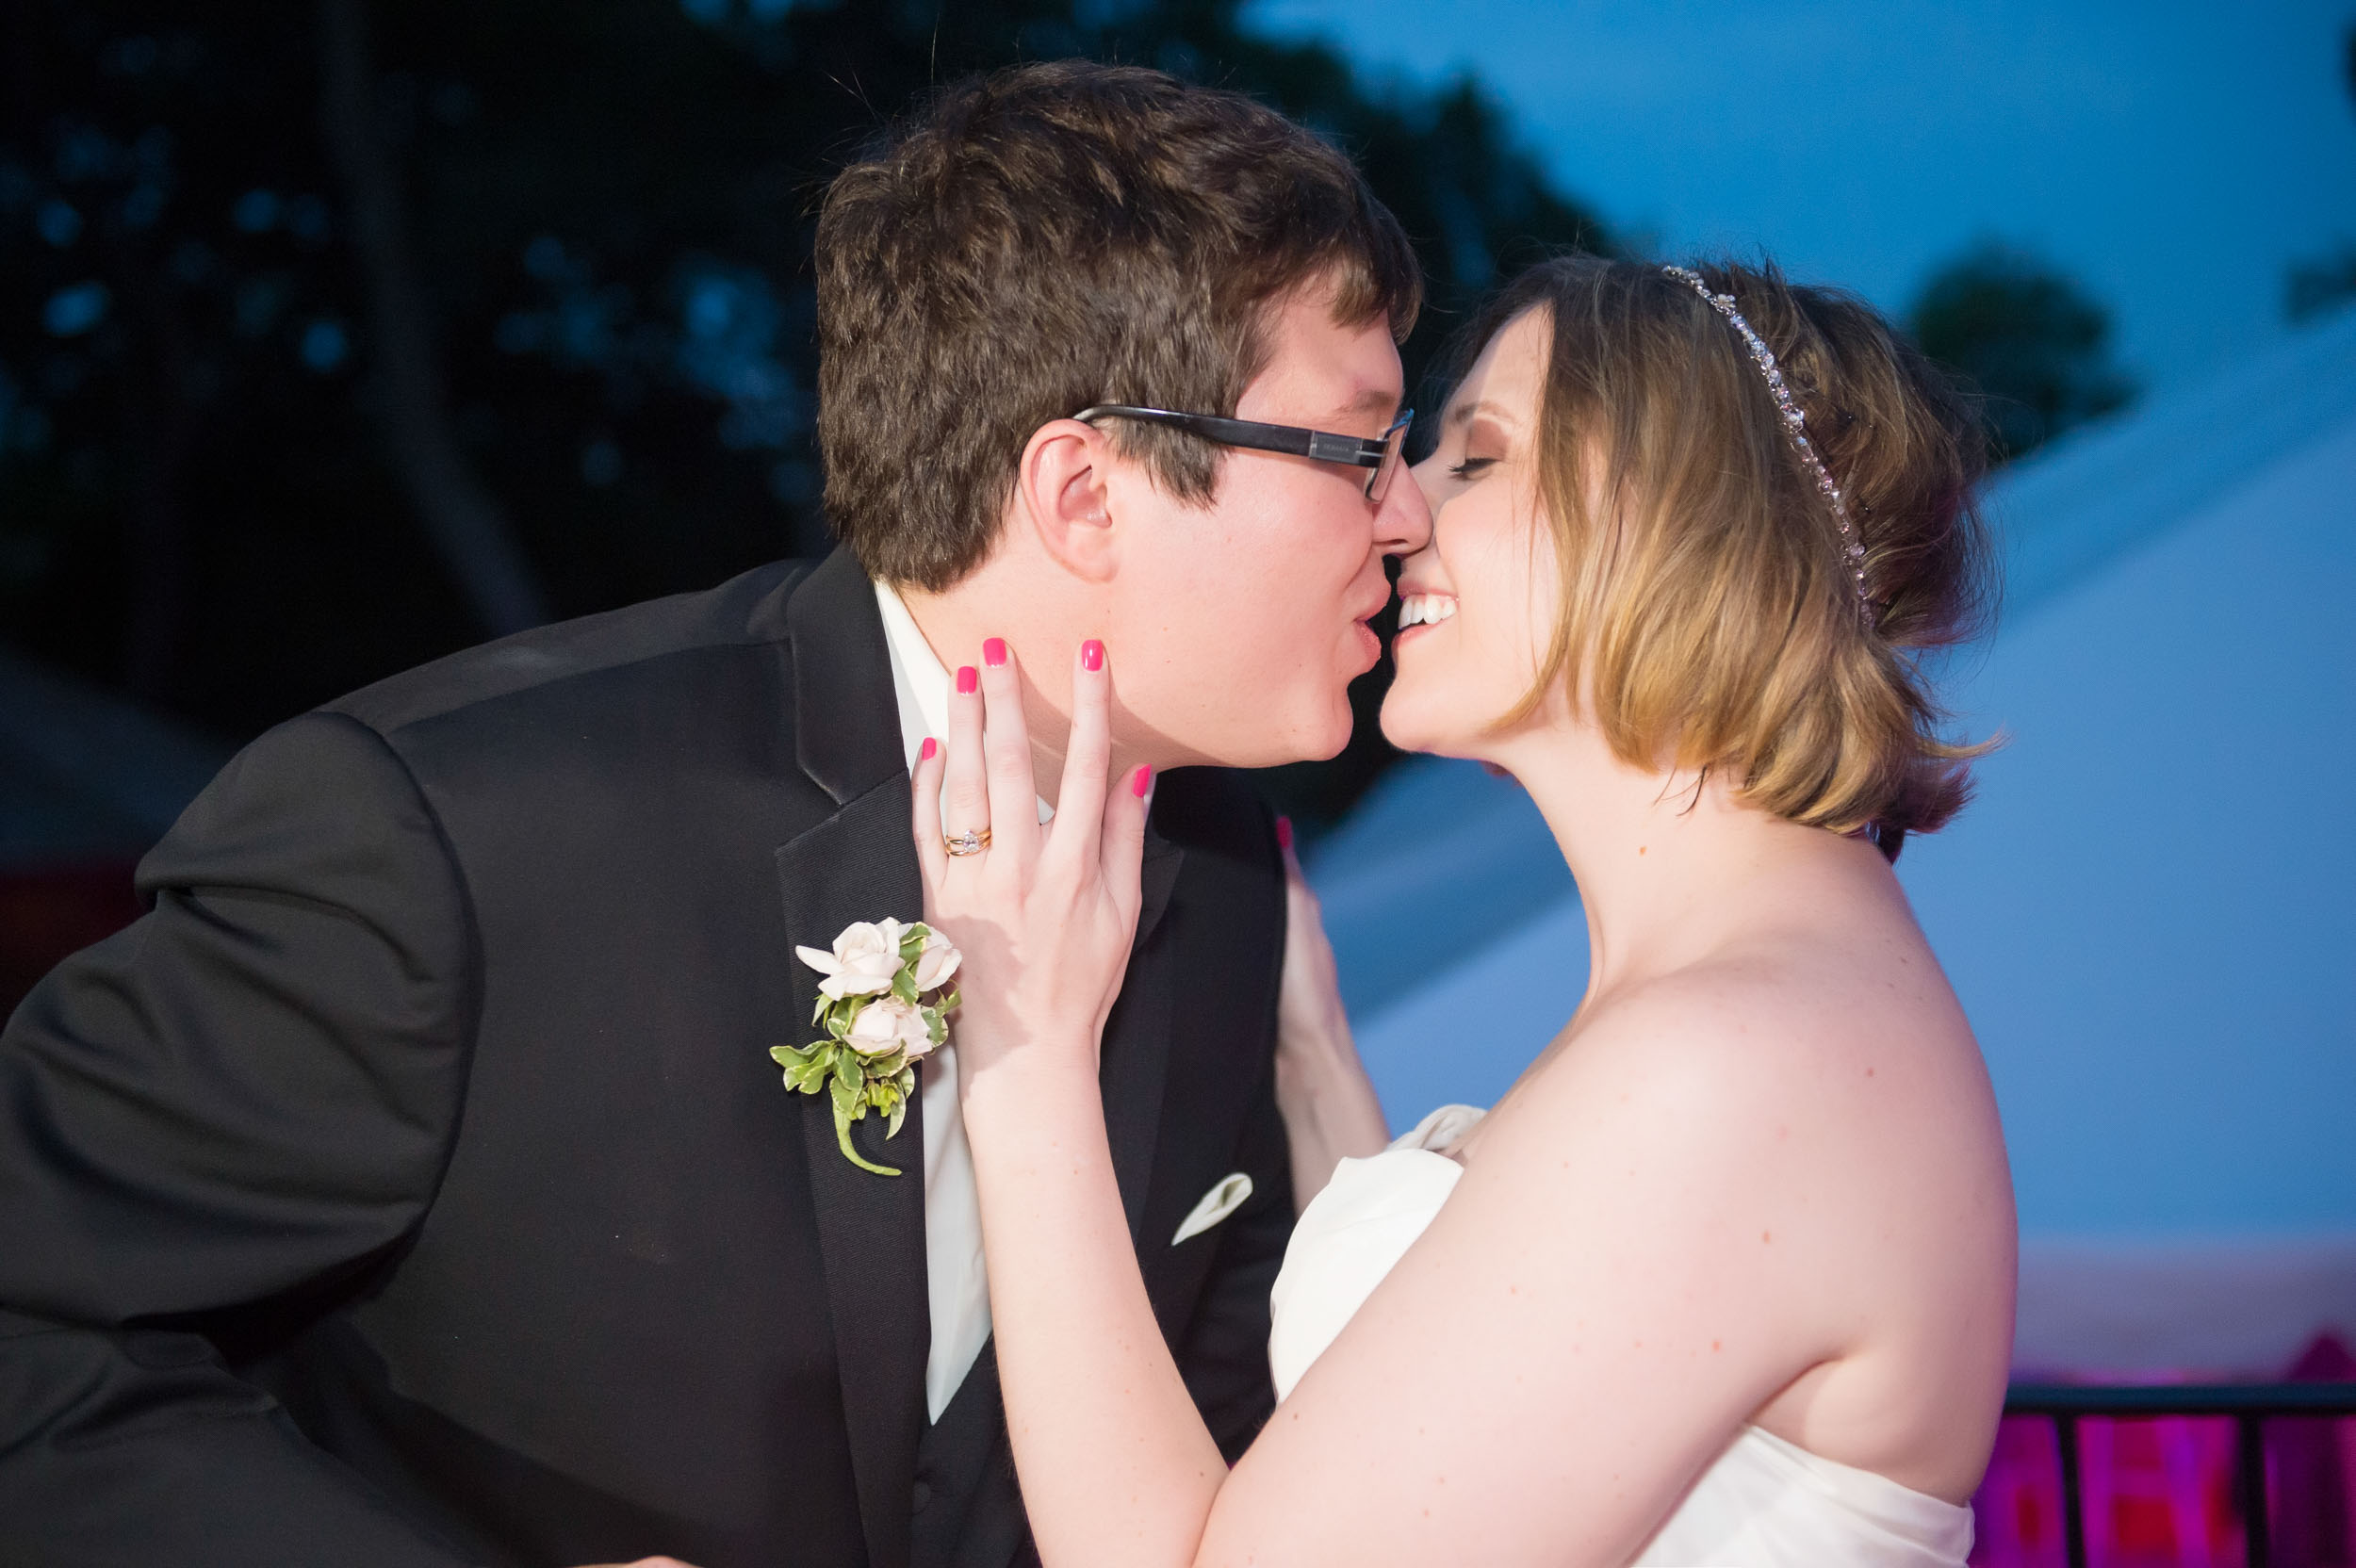 Wedding95KateTim 564*2-Edit-2.jpg